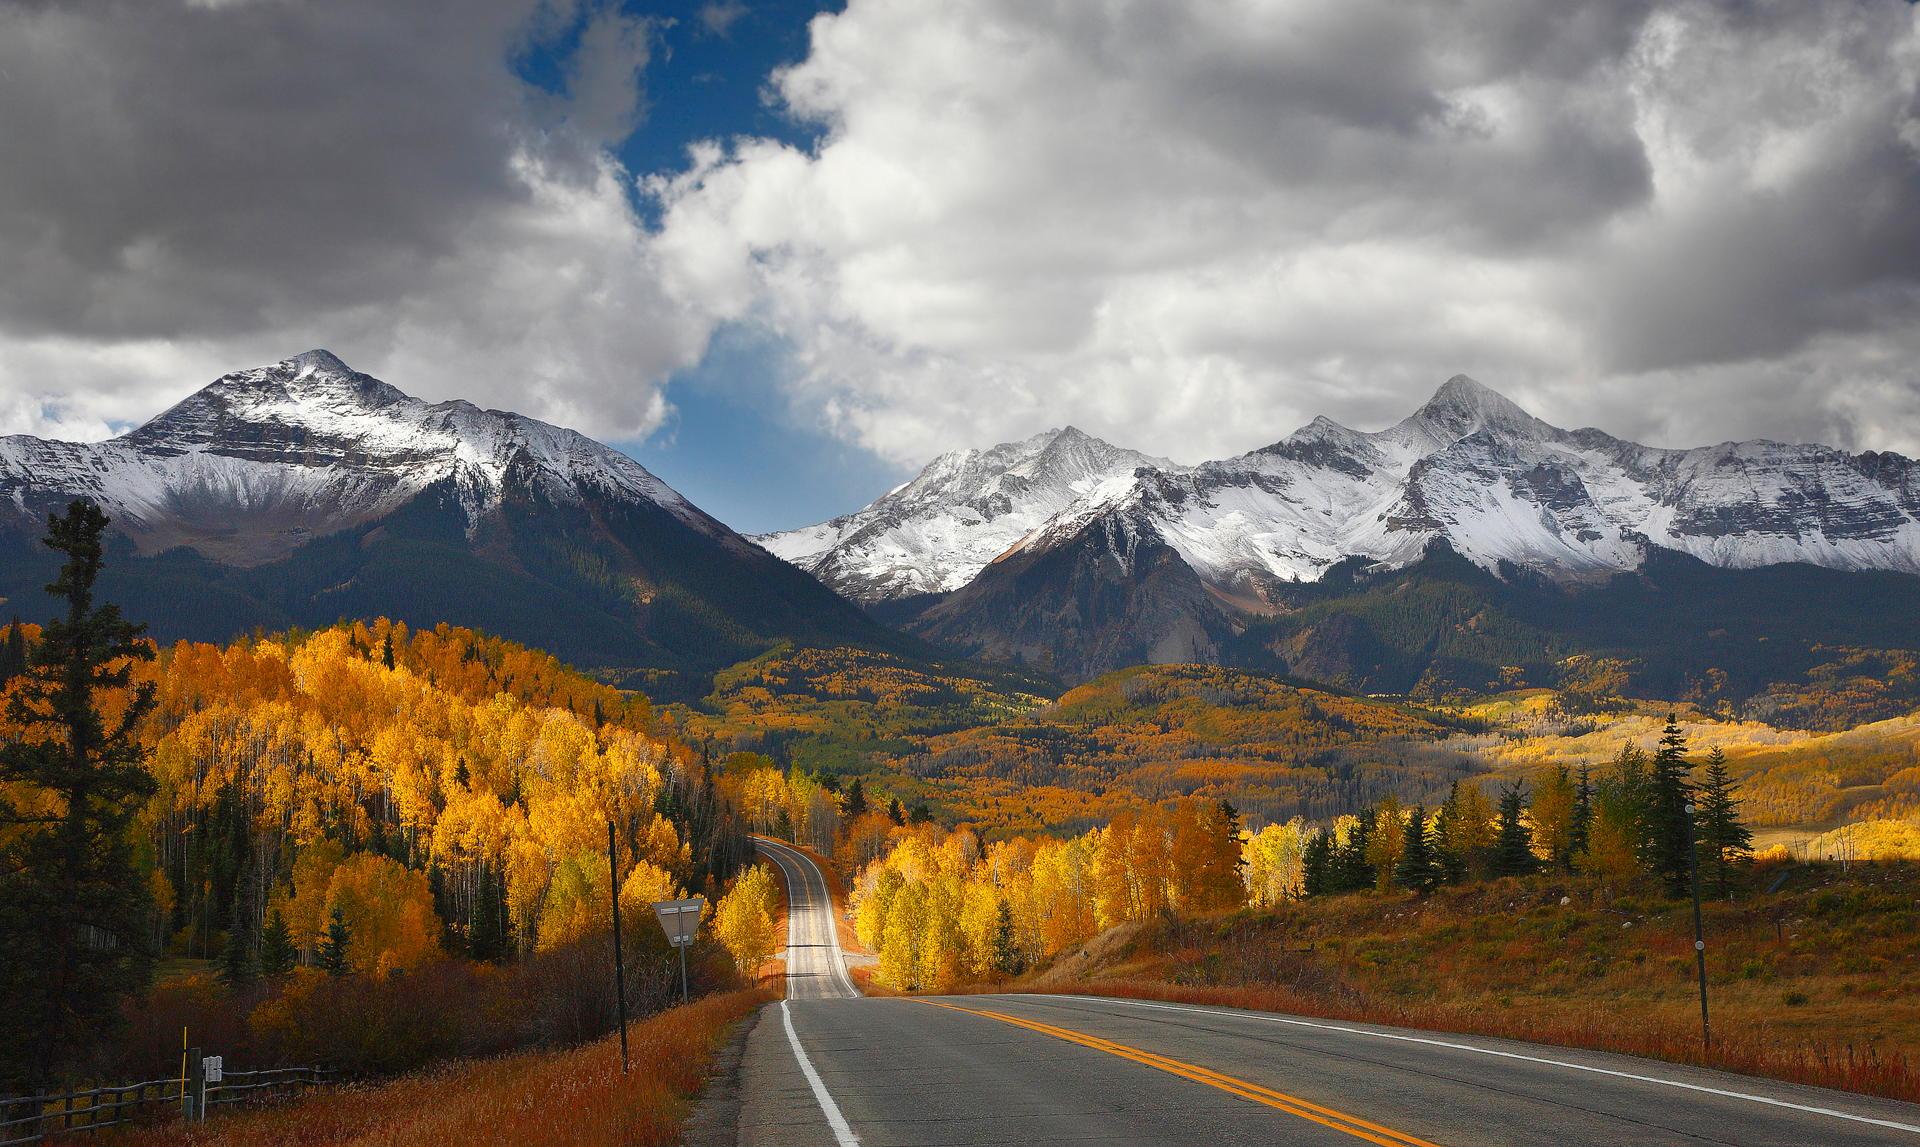 39] Aspen Colorado Desktop Wallpaper on WallpaperSafari 1920x1147